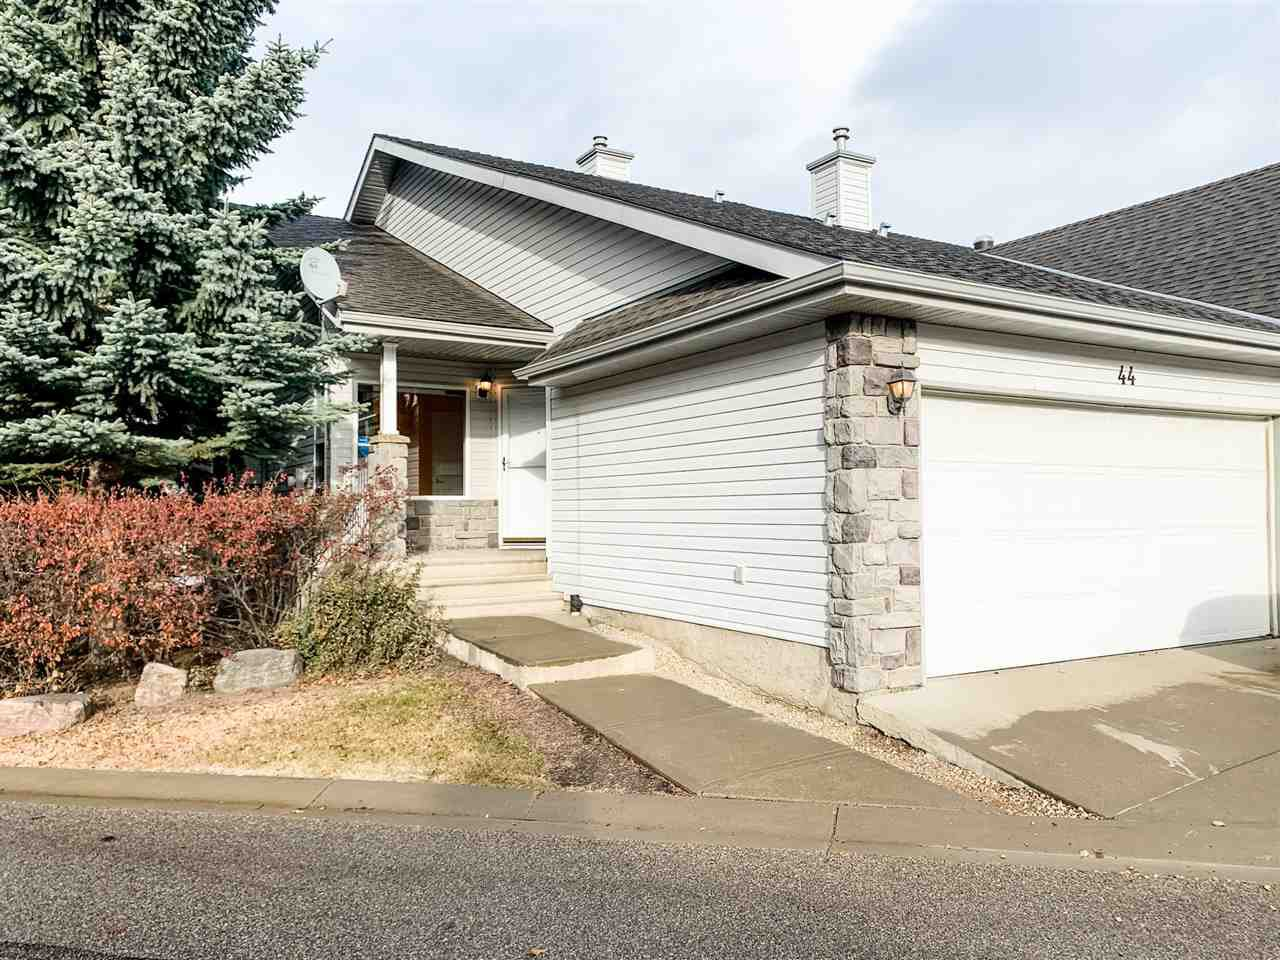 Main Photo: 44 330 Galbraith Close in Edmonton: Zone 58 House Half Duplex for sale : MLS®# E4220364